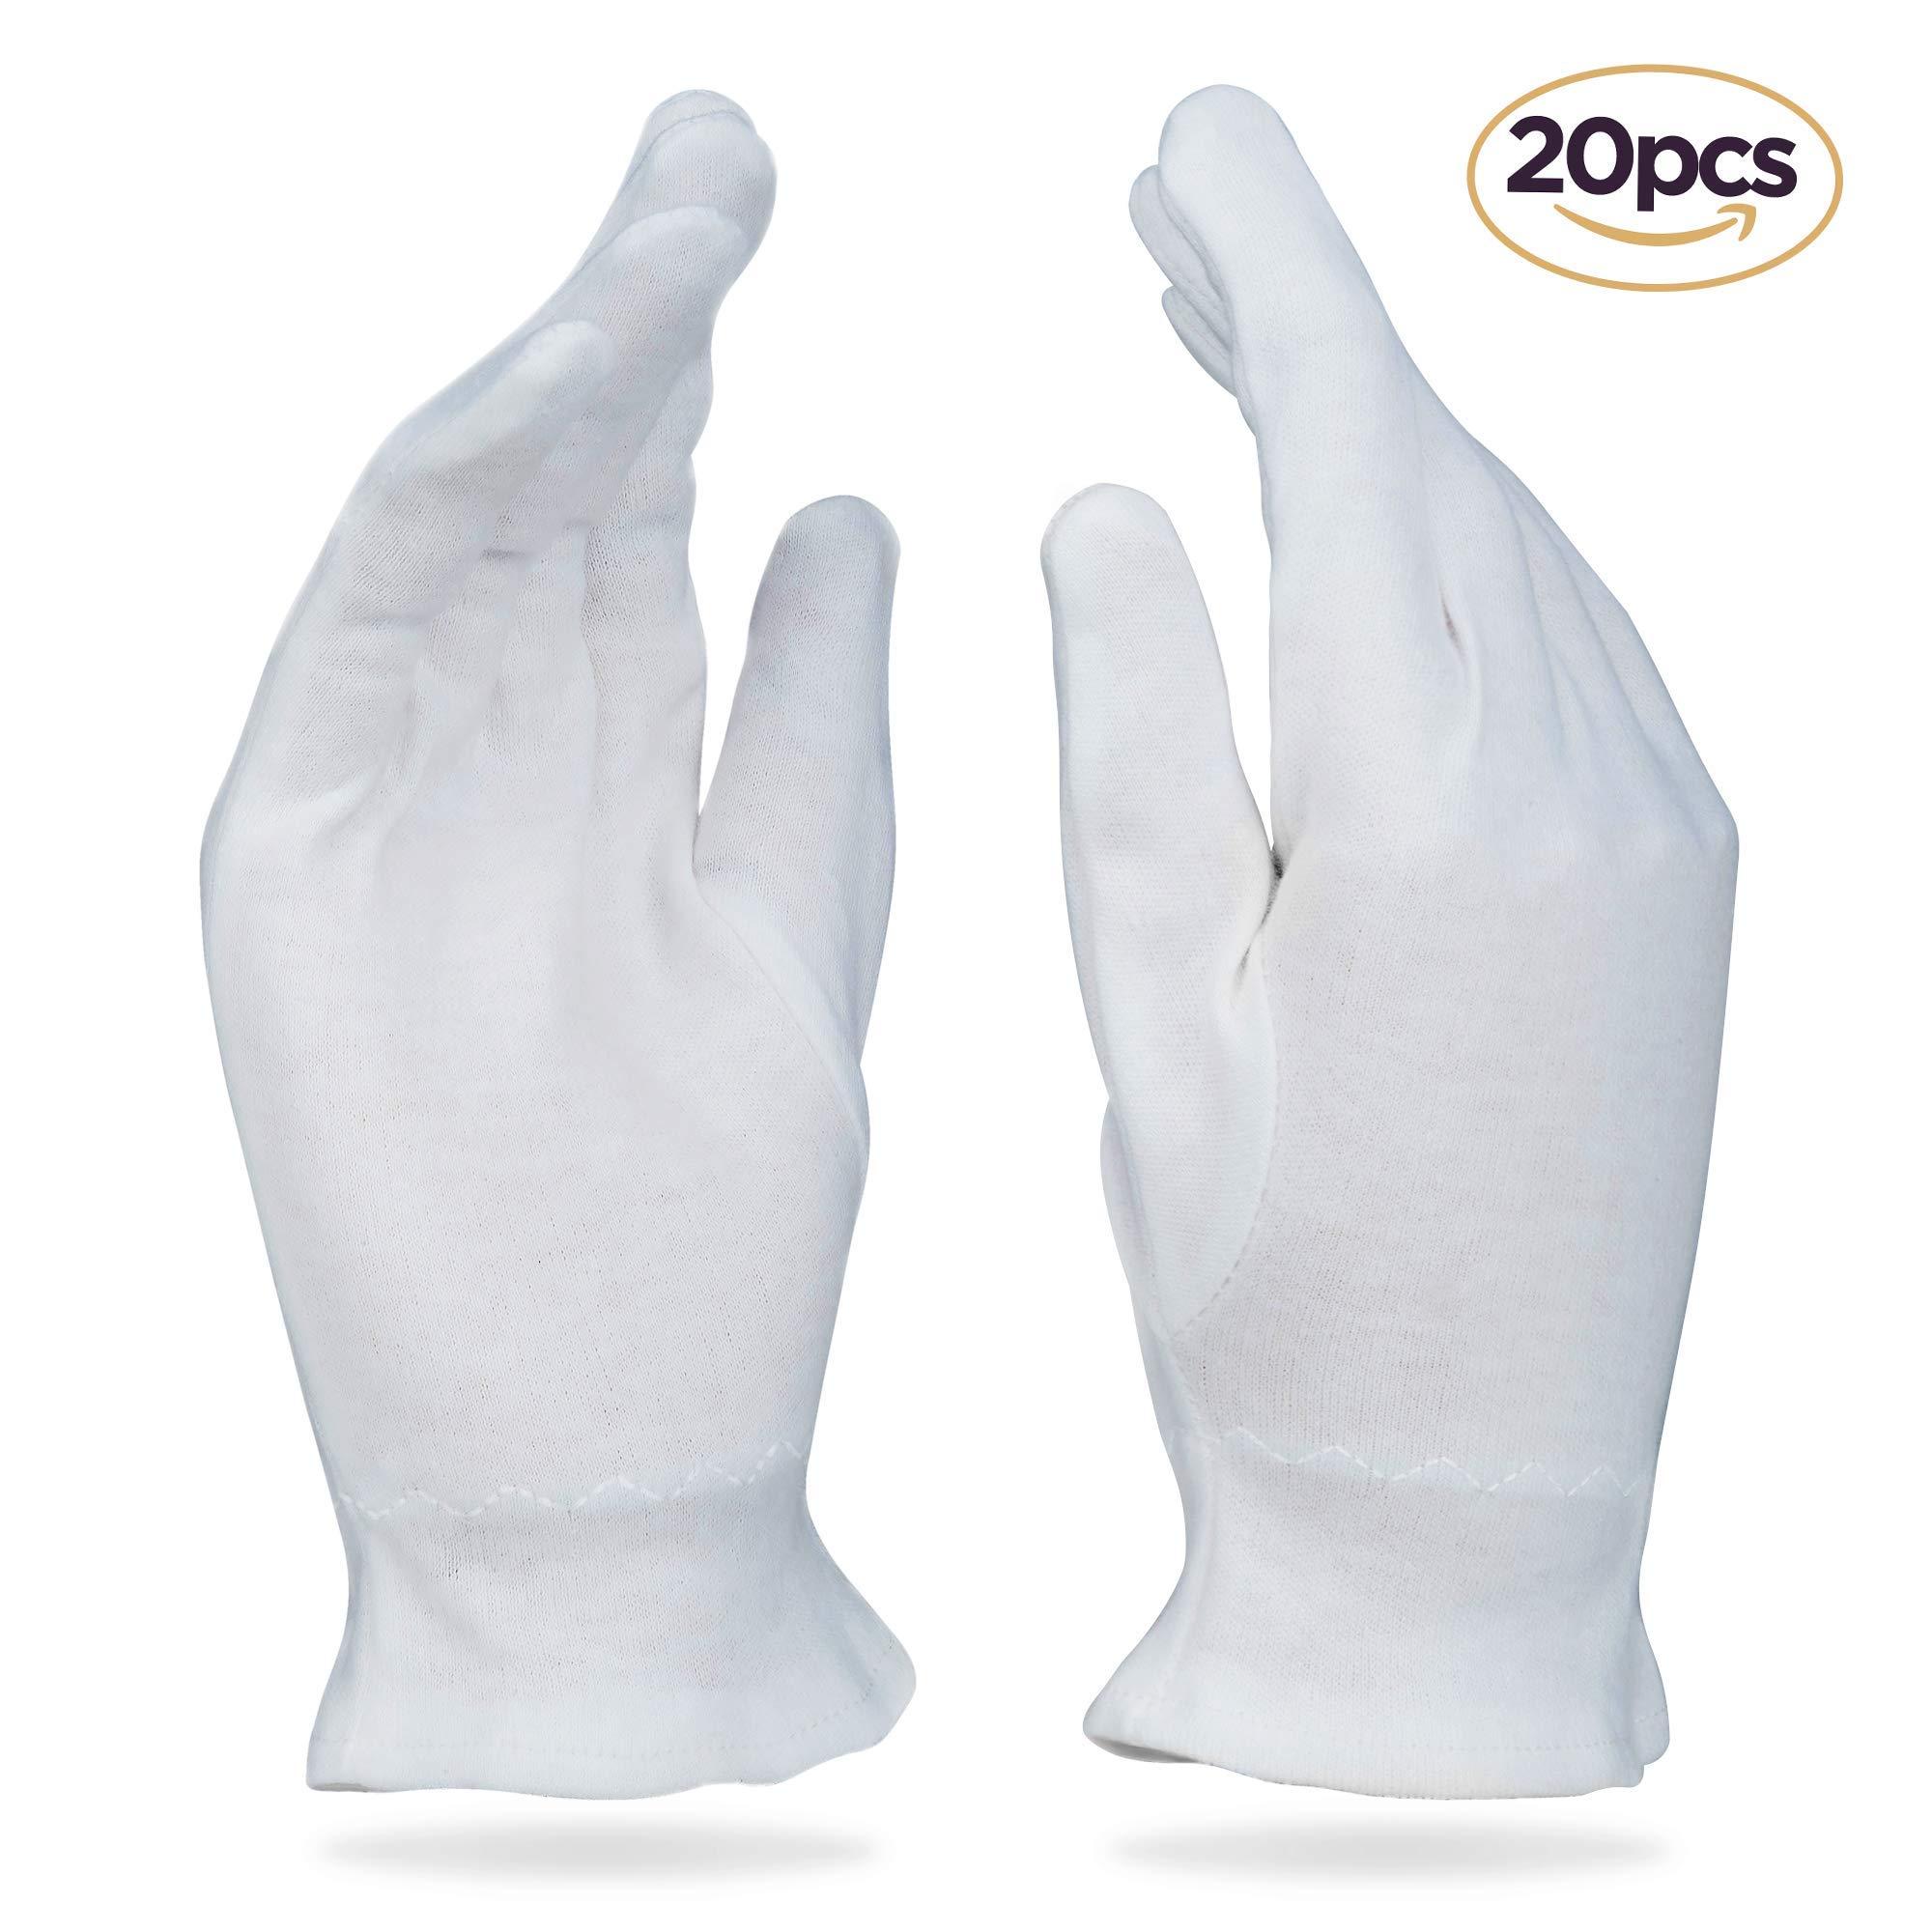 Beauty Care Wear Medium White Cotton Gloves for Eczema, Dry Skin, Moisturizing - 20 Gloves